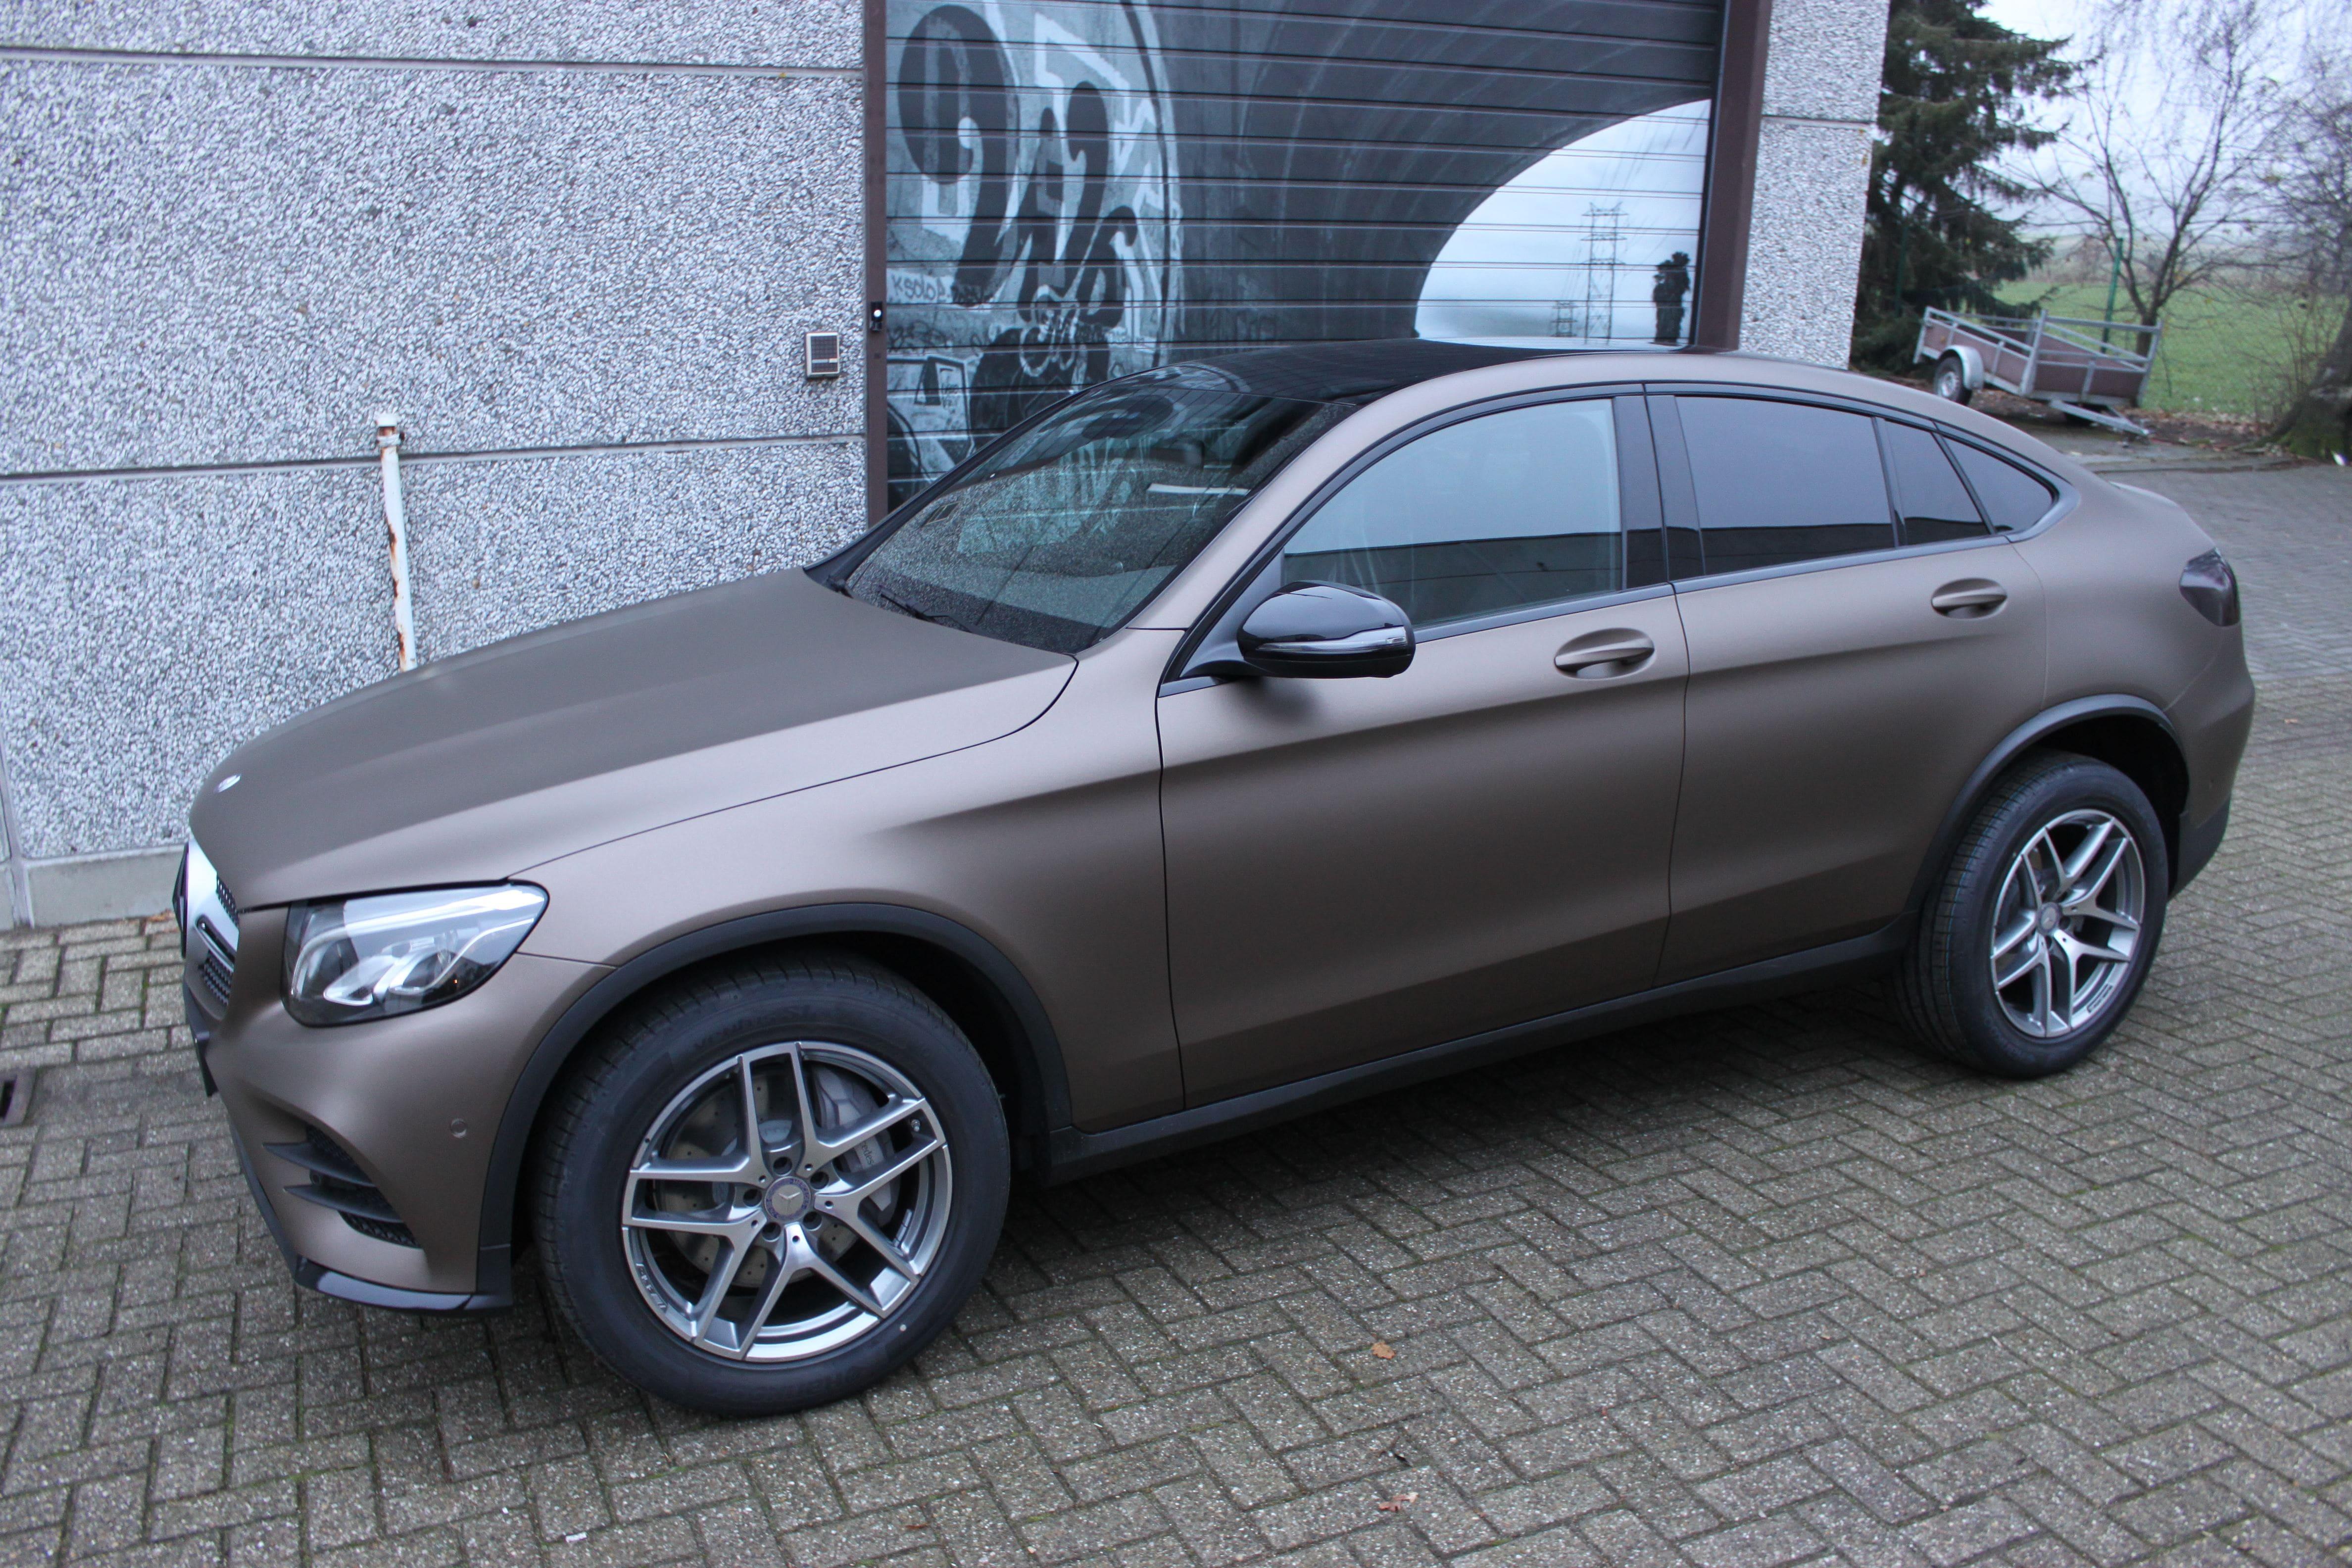 Mercedes GLC Coupe Matte metallic brown, Carwrapping door Wrapmyride.nu Foto-nr:9356, ©2021